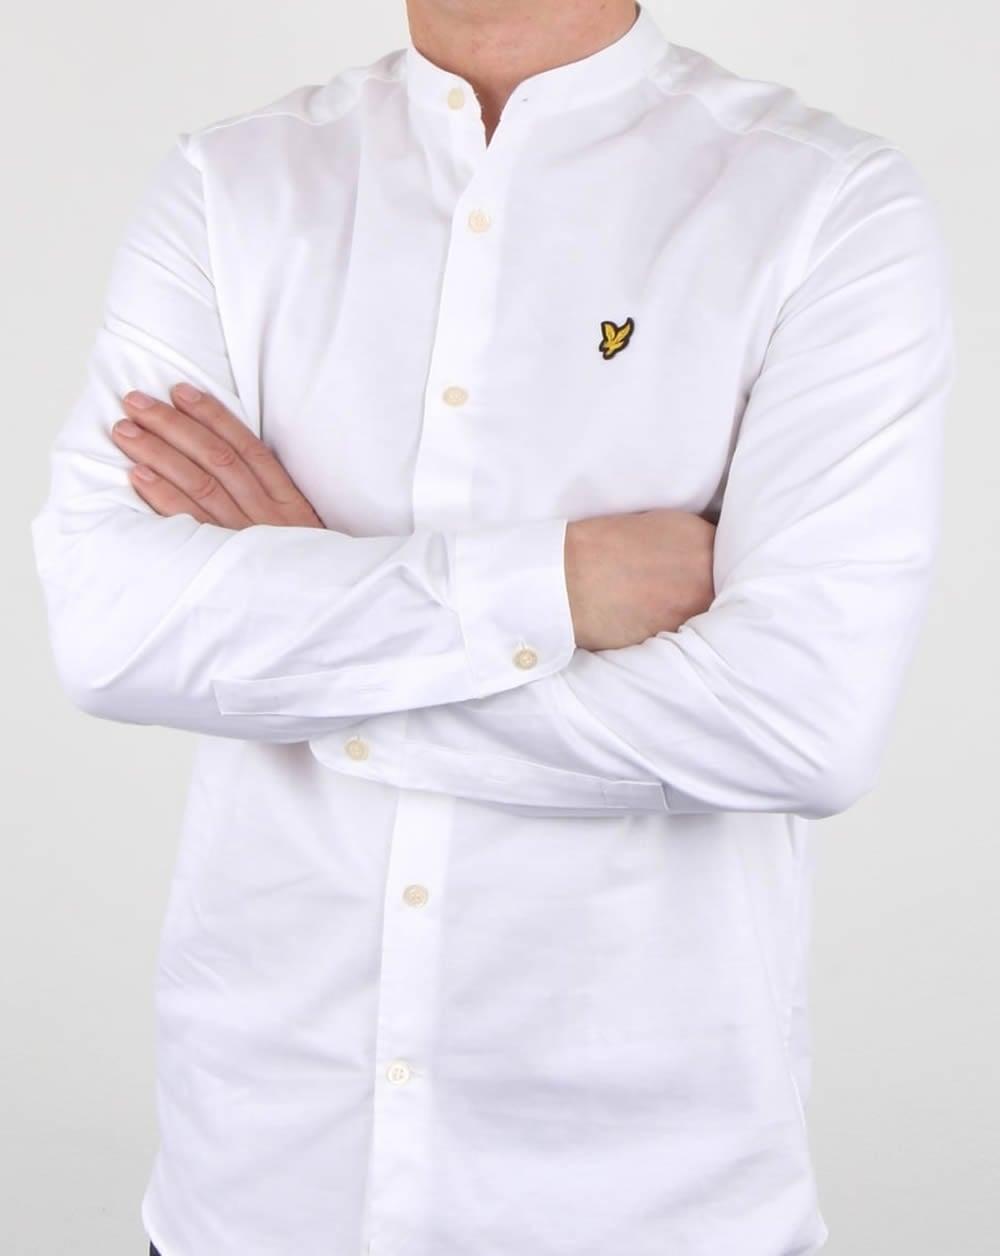 Lyle and scott grandad collar shirt white mens long for Lyle and scott shirt sale